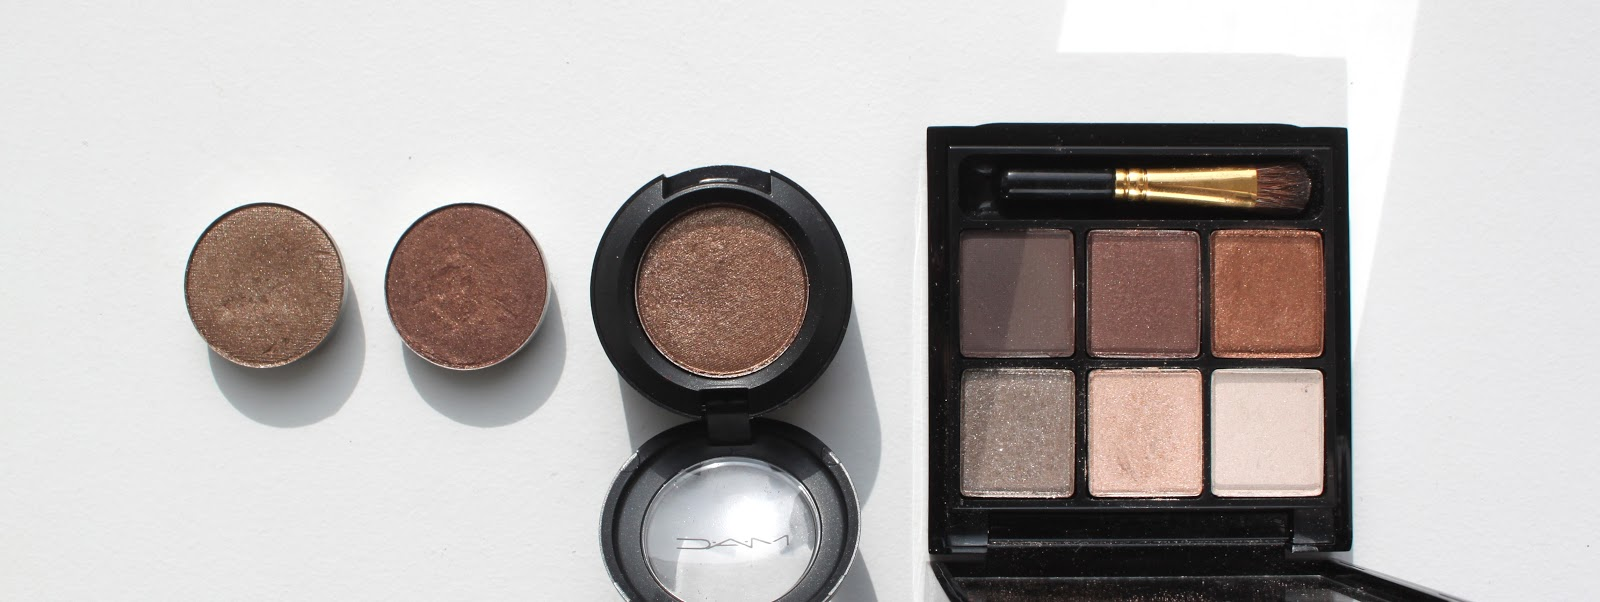 MAC Cosmetics  Home  Facebook